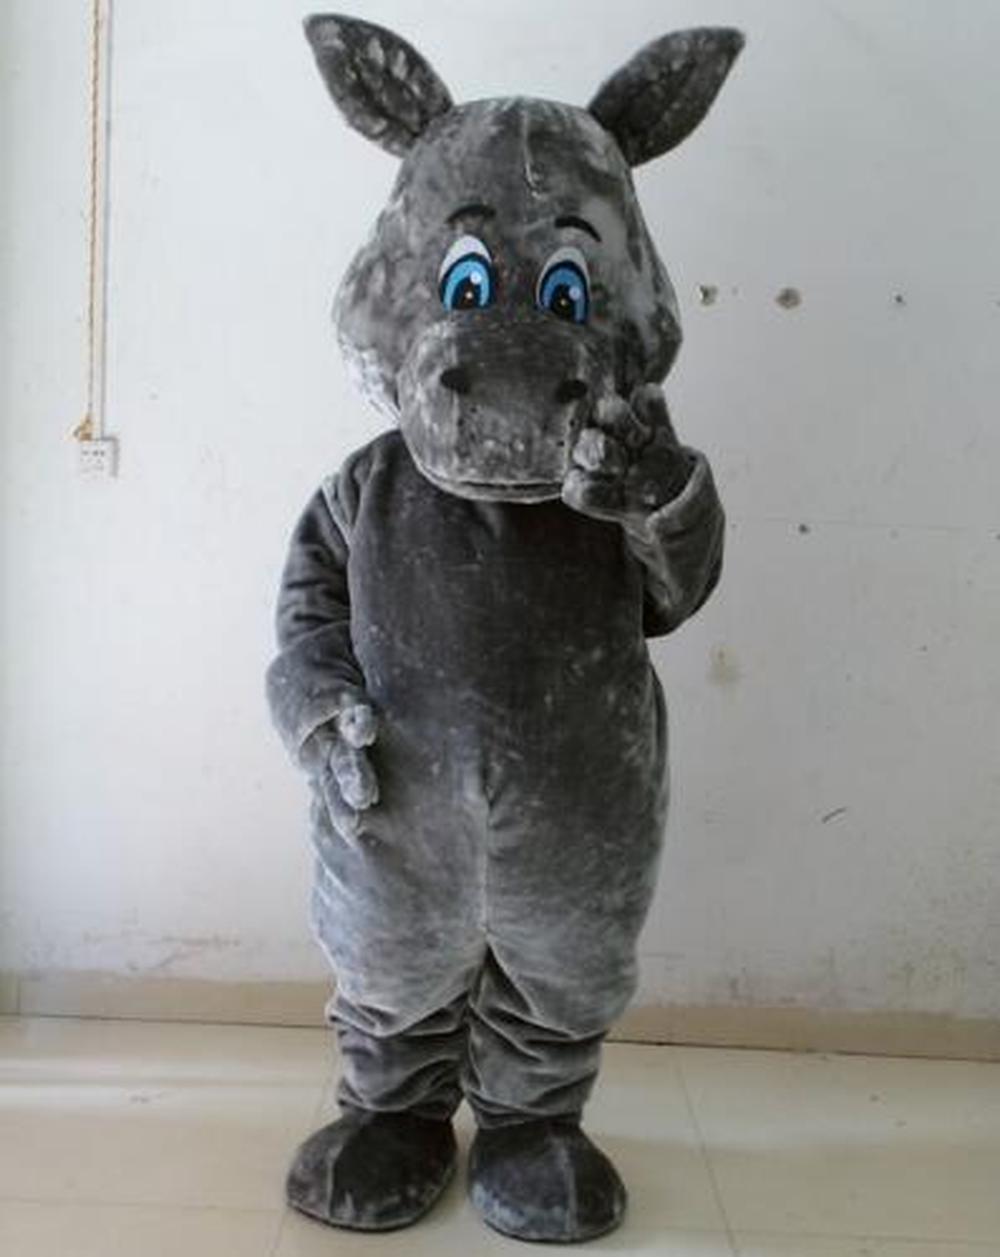 Disfraz de Mascota de hipopótamo gris de cabeza grande para adultos disfraz de disfraces de Halloween desfile